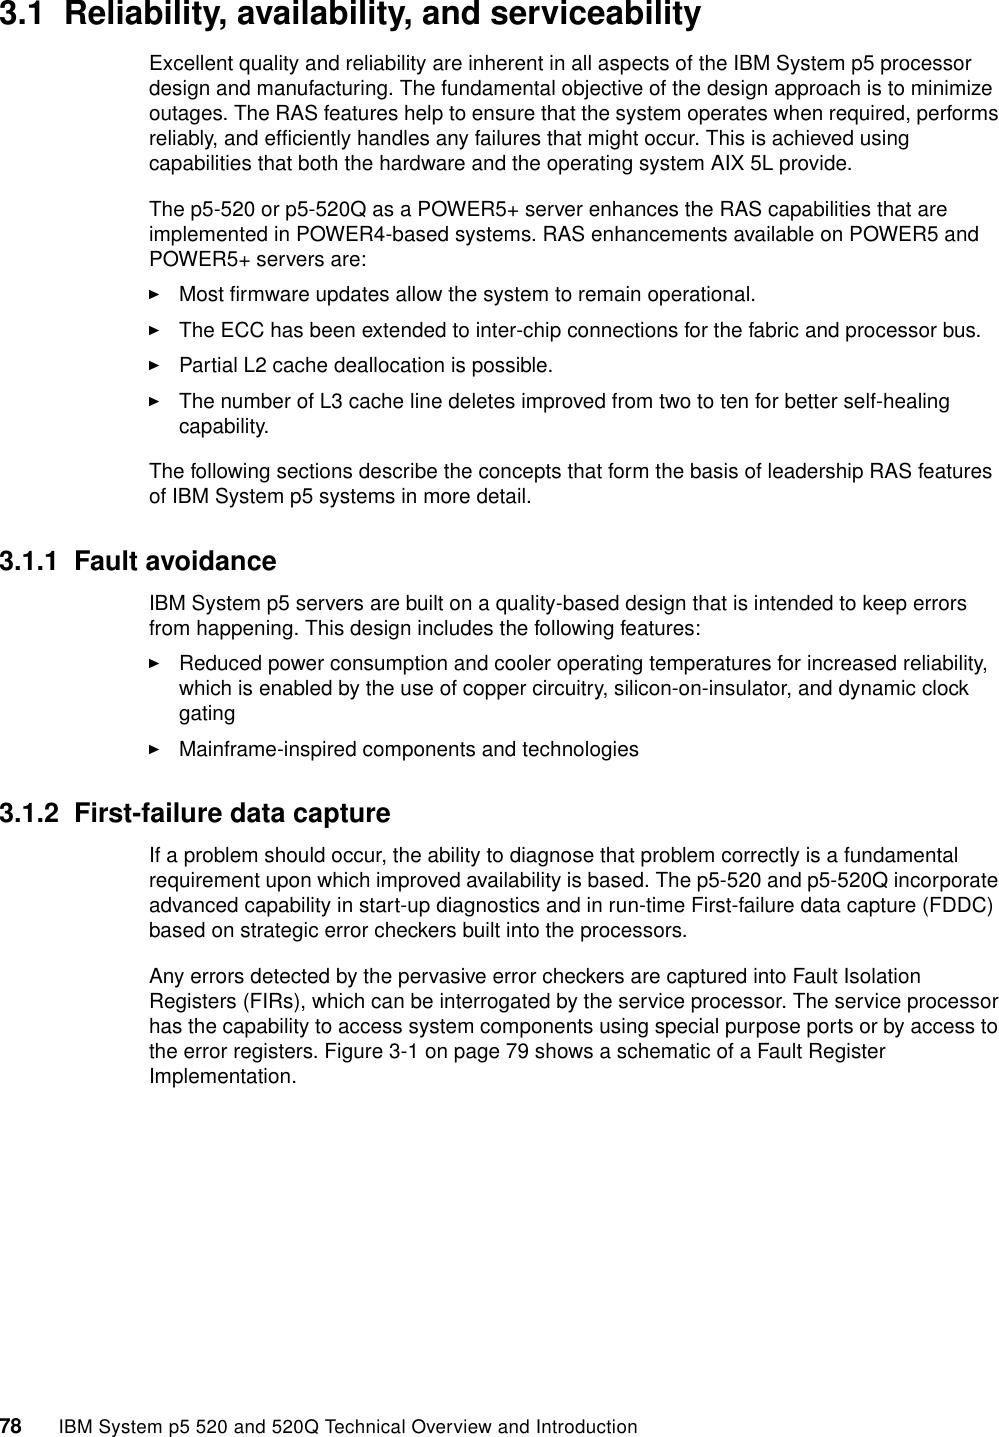 Ibm Redpaper 520Q Users Manual GST, Inc  System P, P5